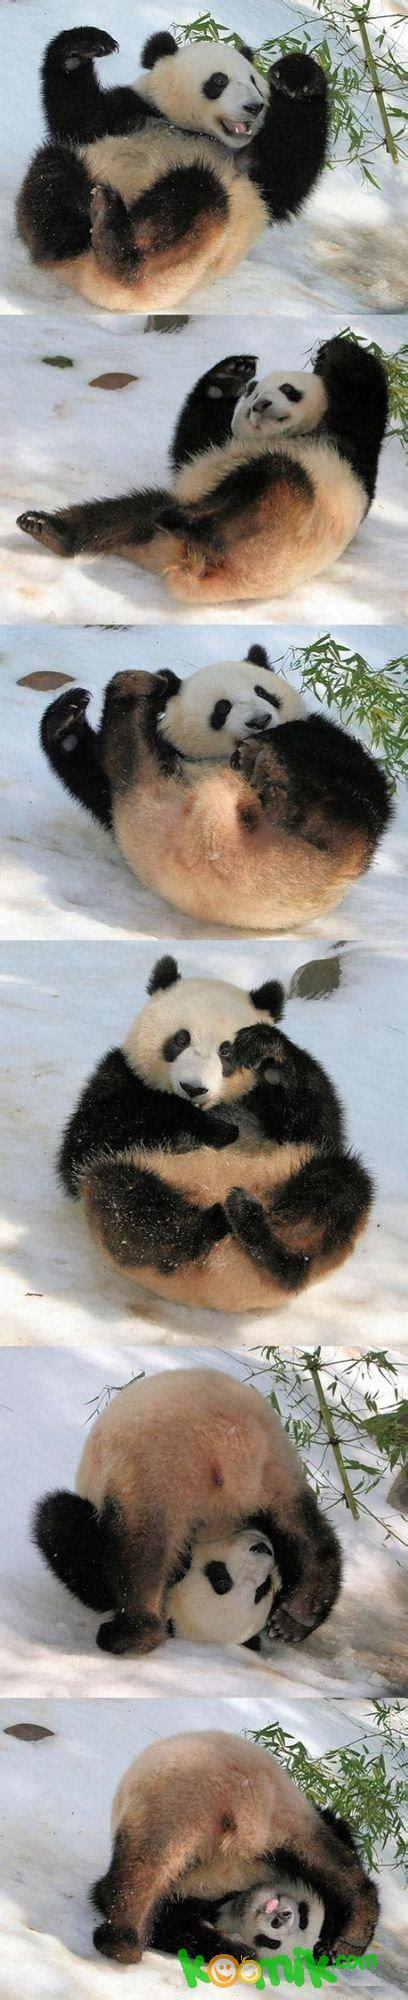 Komik Panda 1 3 oyuncu panda komik resim